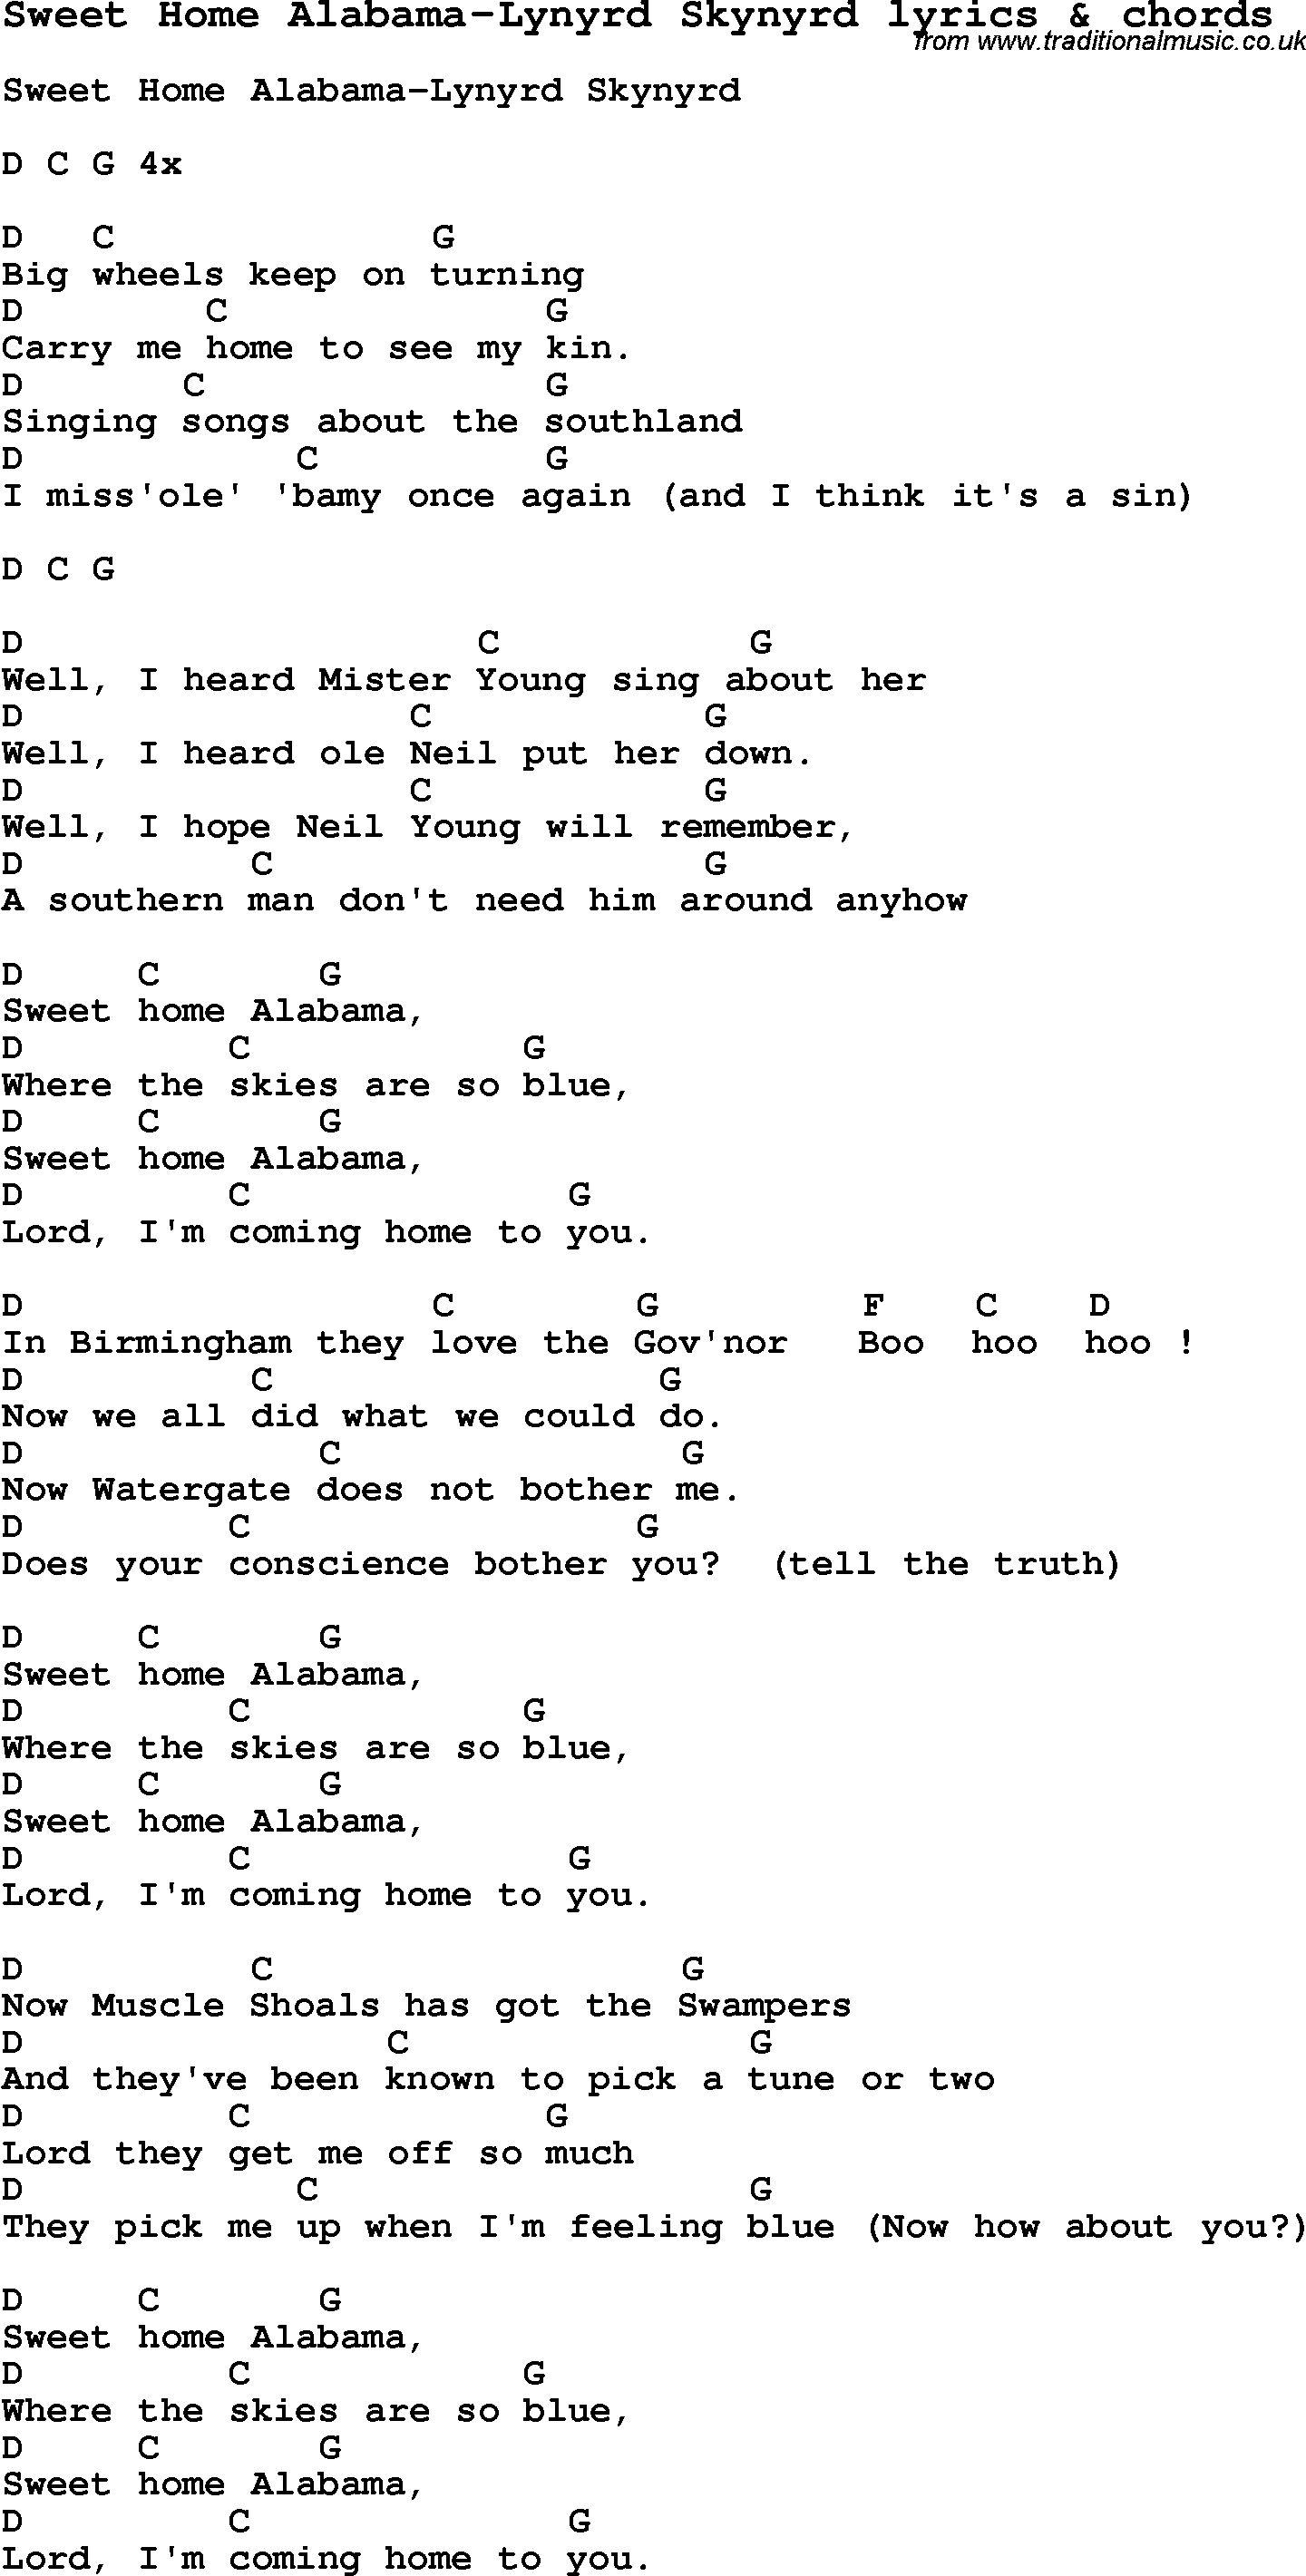 Sweet Home Alabama Chords Sweet Home Alabama Lyrics Sweet Home Alabama Chords Sweet Home Alabama